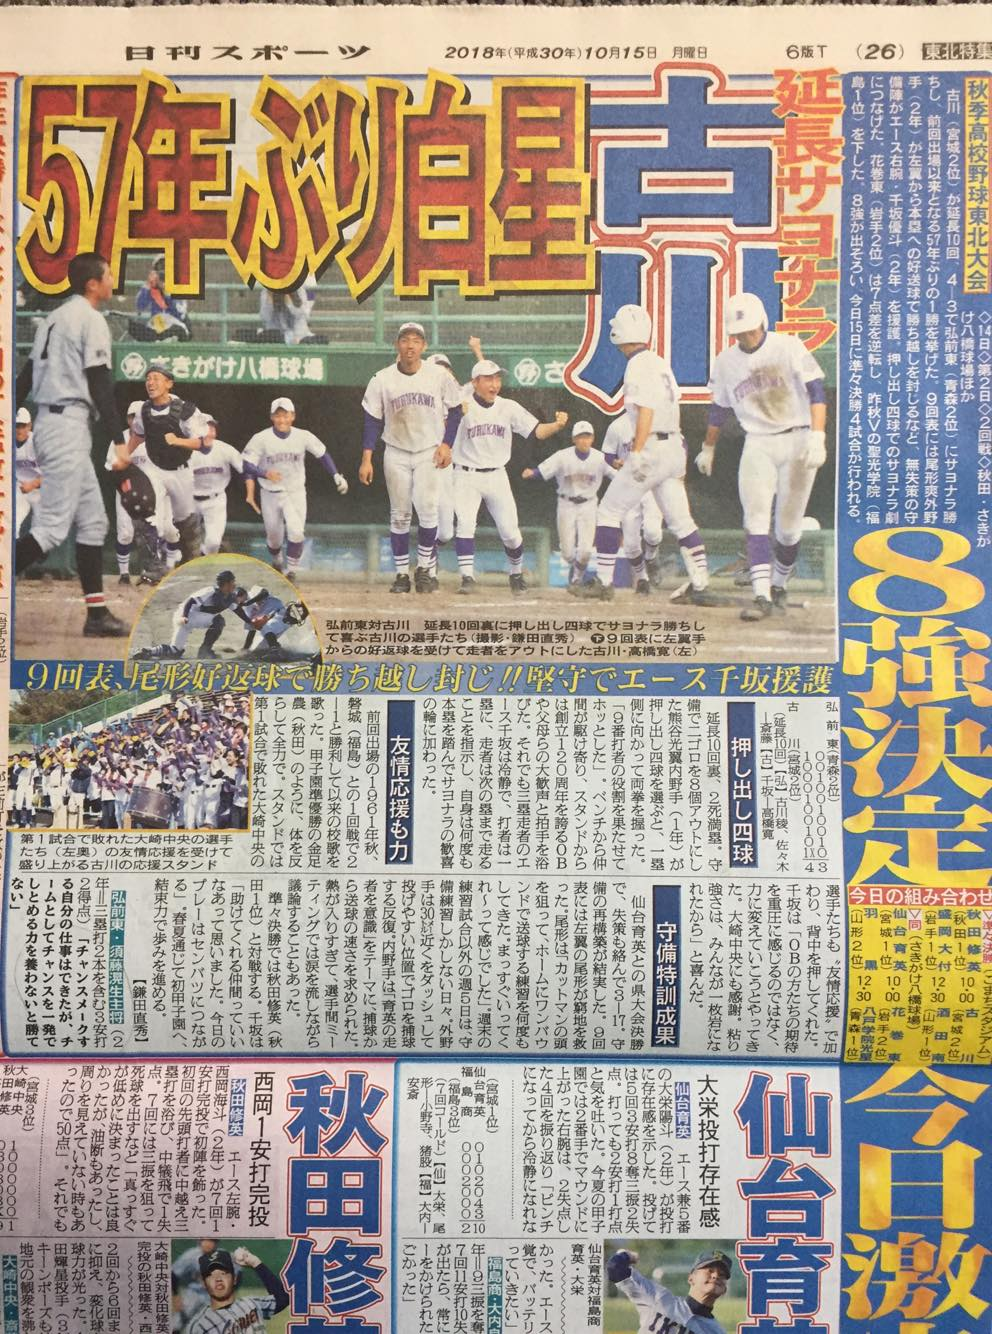 www5e.biglobe.ne.jp